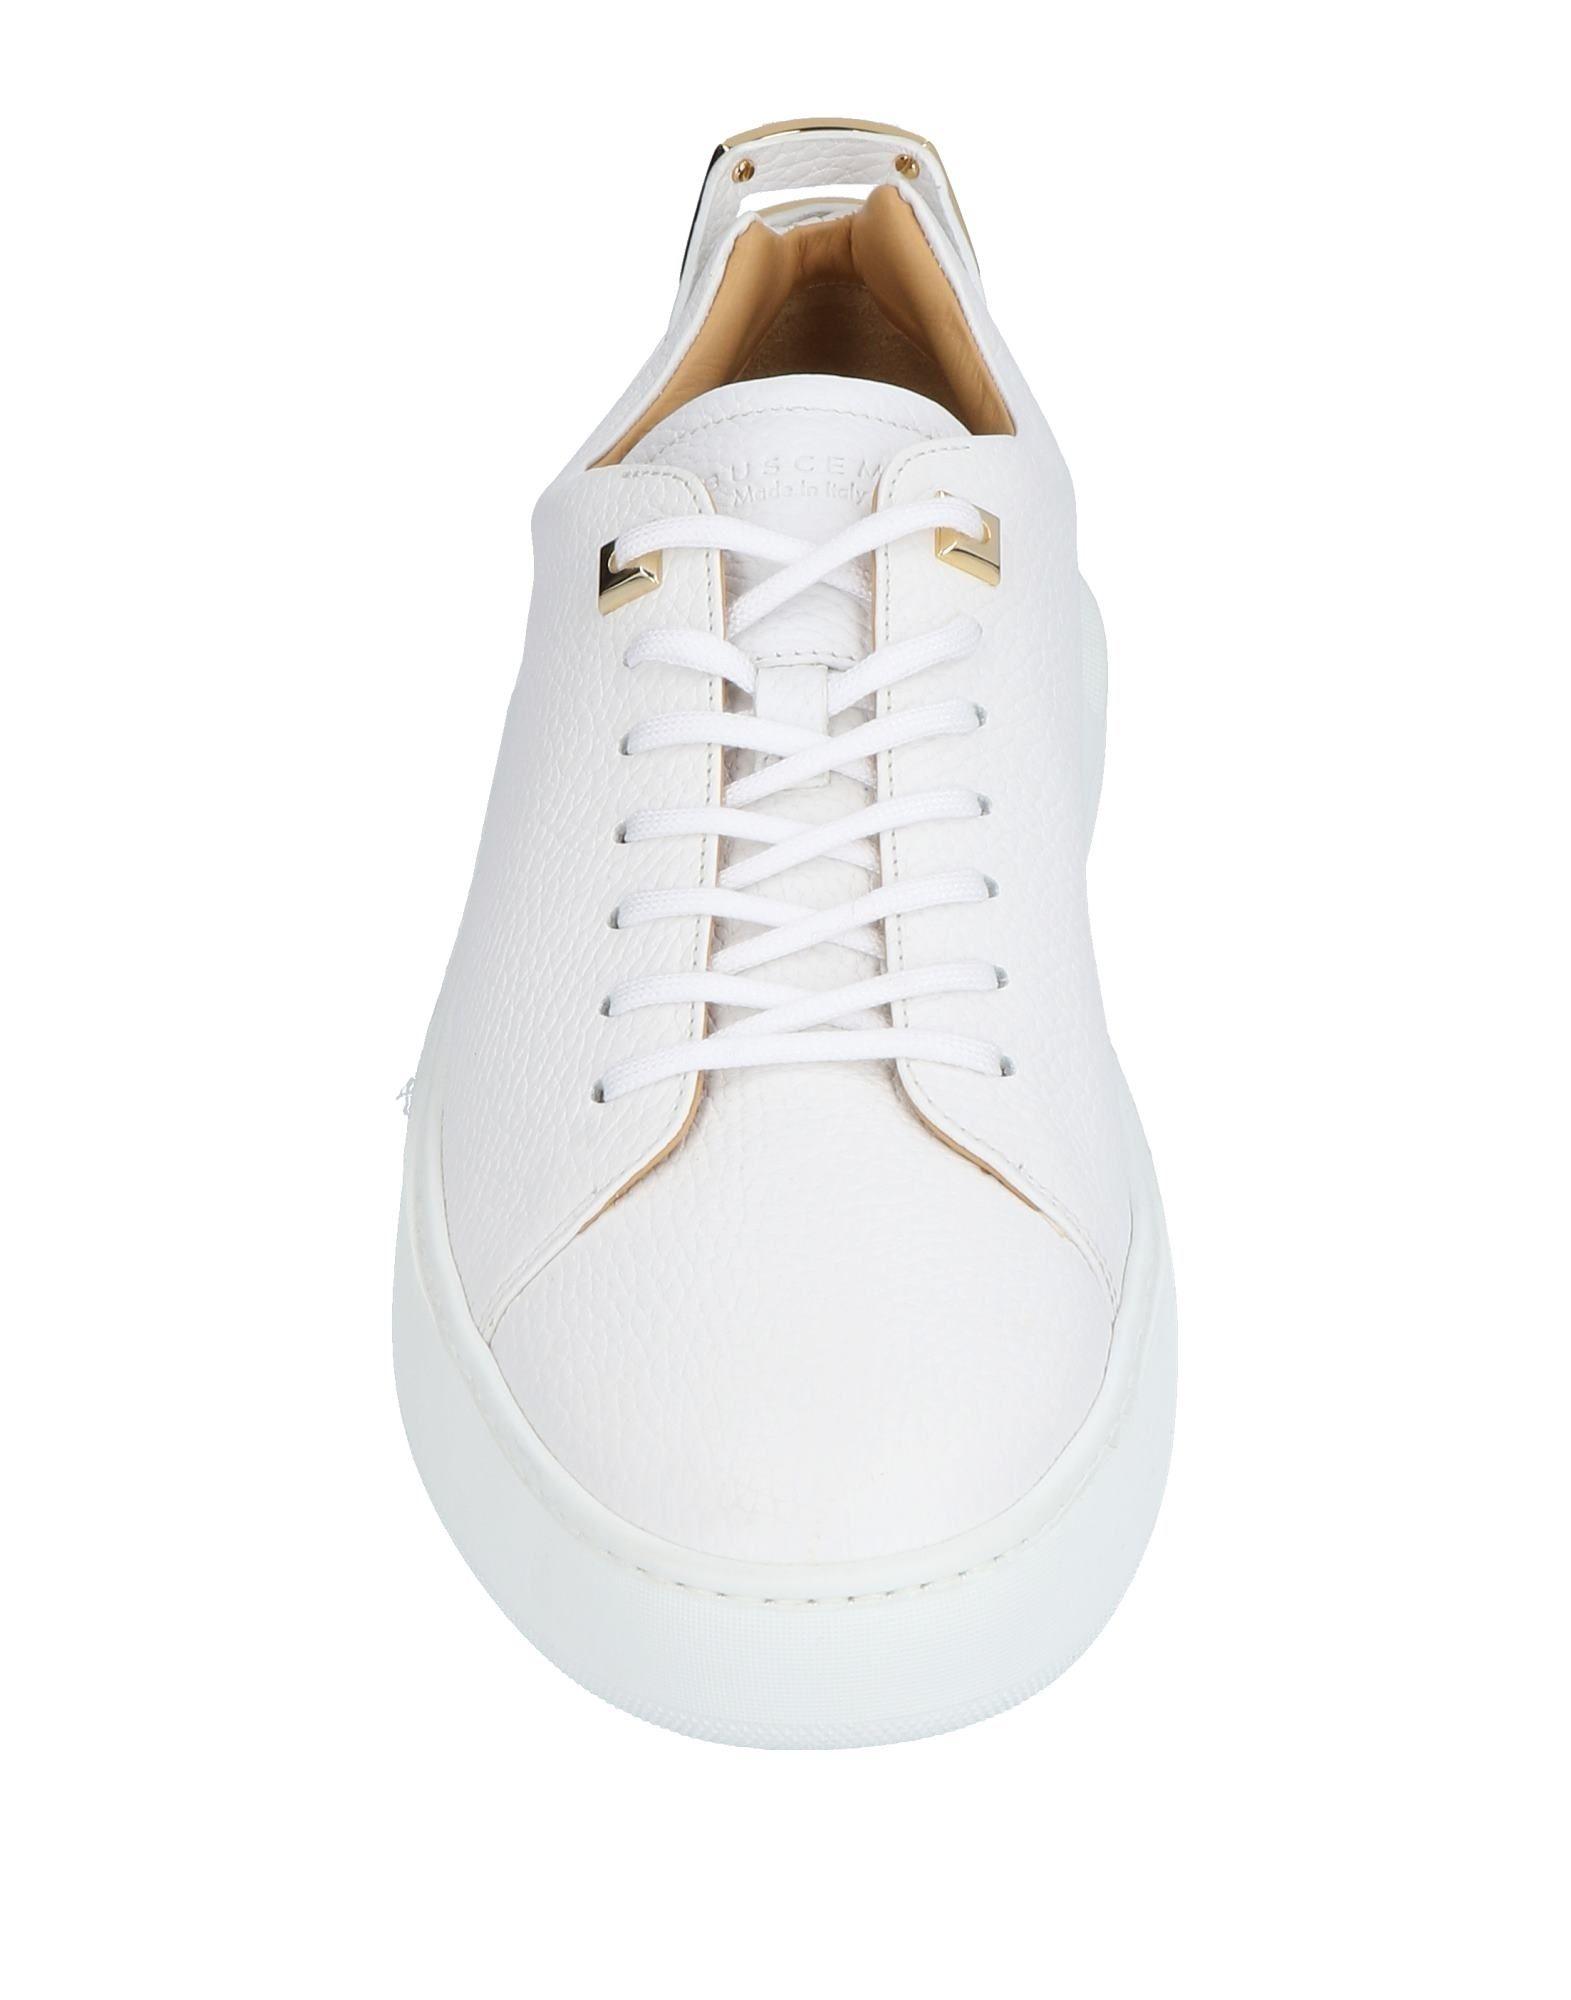 Buscemi Sneakers Herren  11364661MX Gute Qualität beliebte Schuhe